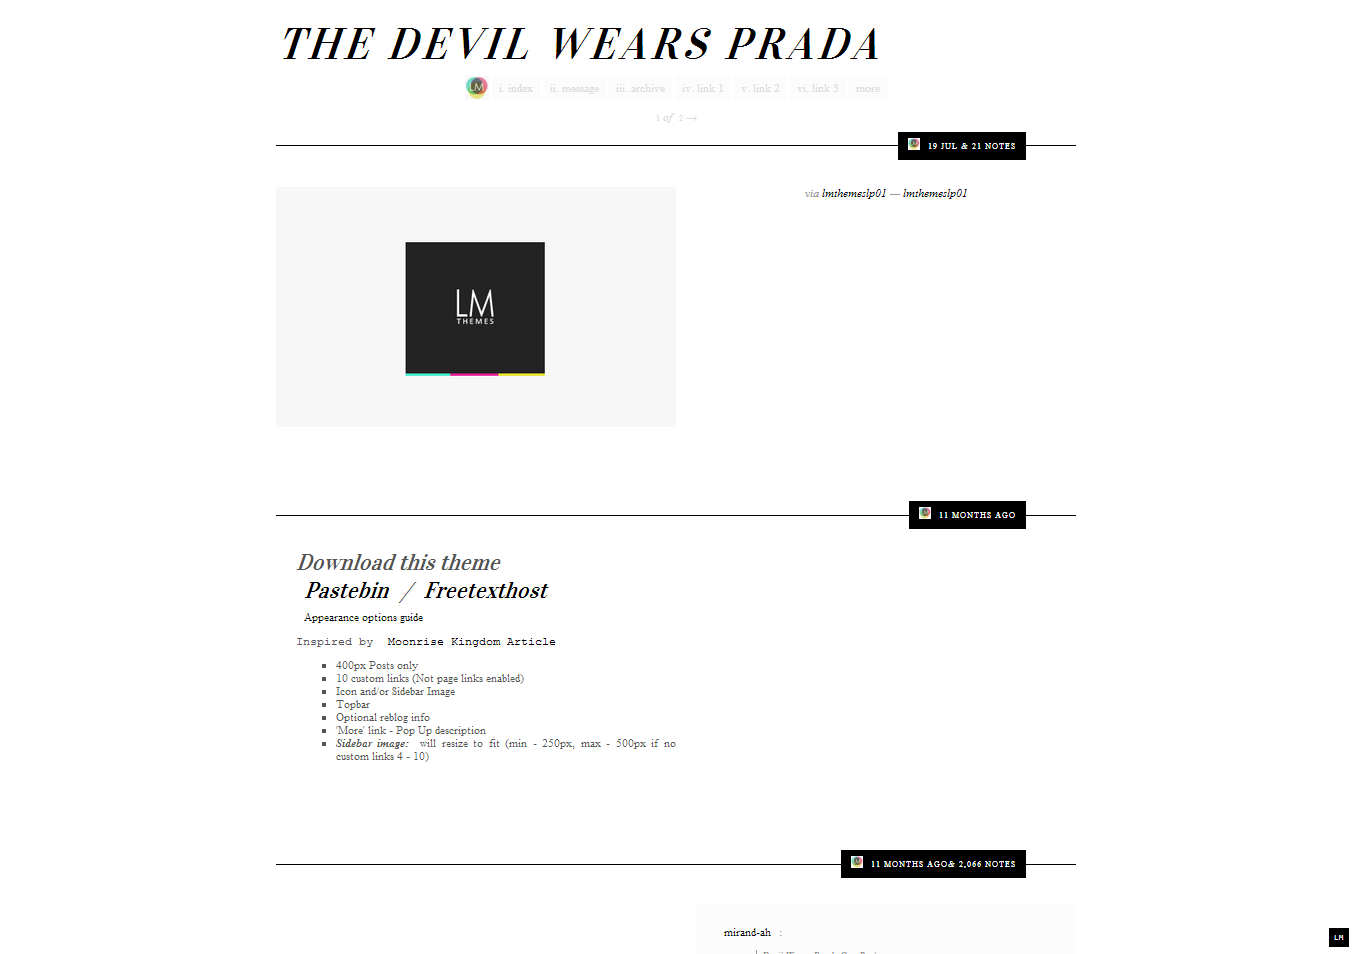 the devil wears prada theme